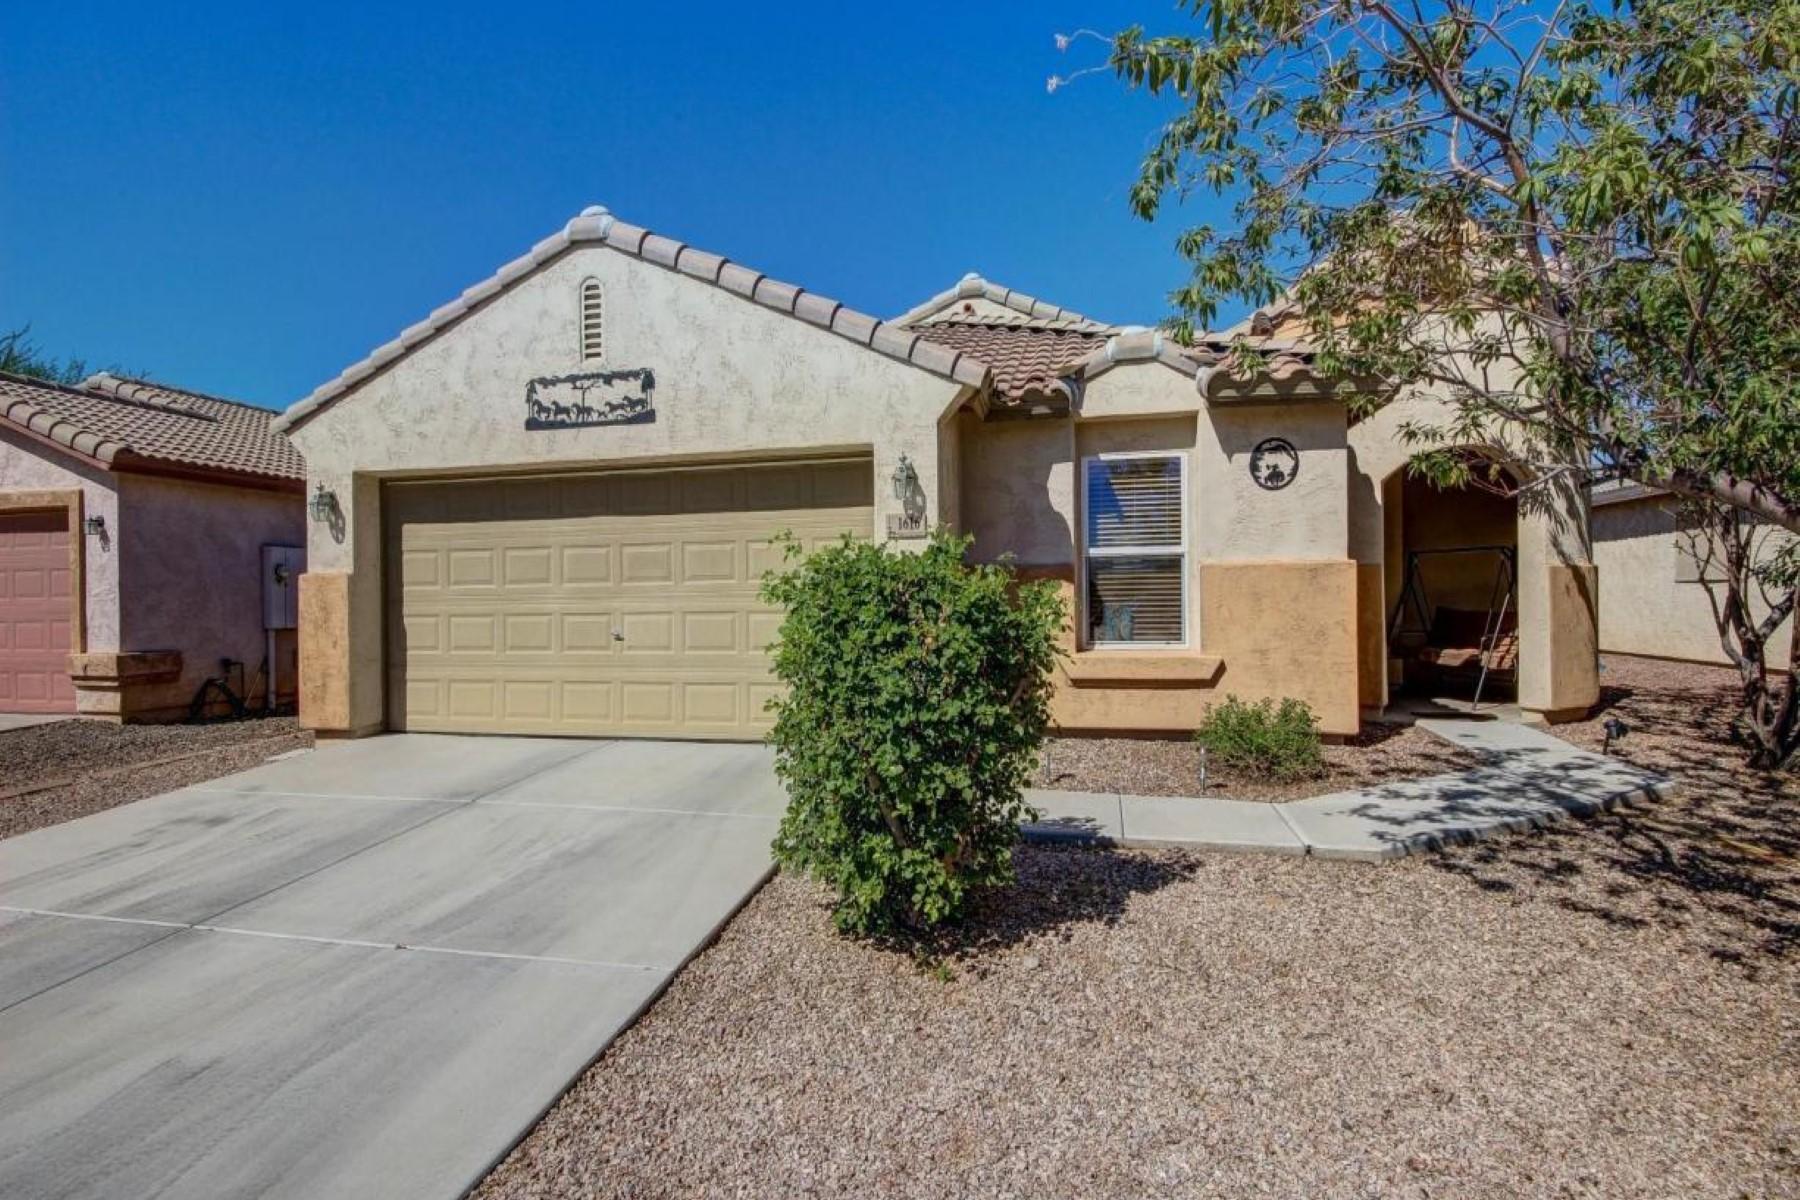 Maison unifamiliale pour l Vente à Super home in a quiet neighborhood in buckeye's east side 1616 E Maplewood Ave Buckeye, Arizona, 85326 États-Unis